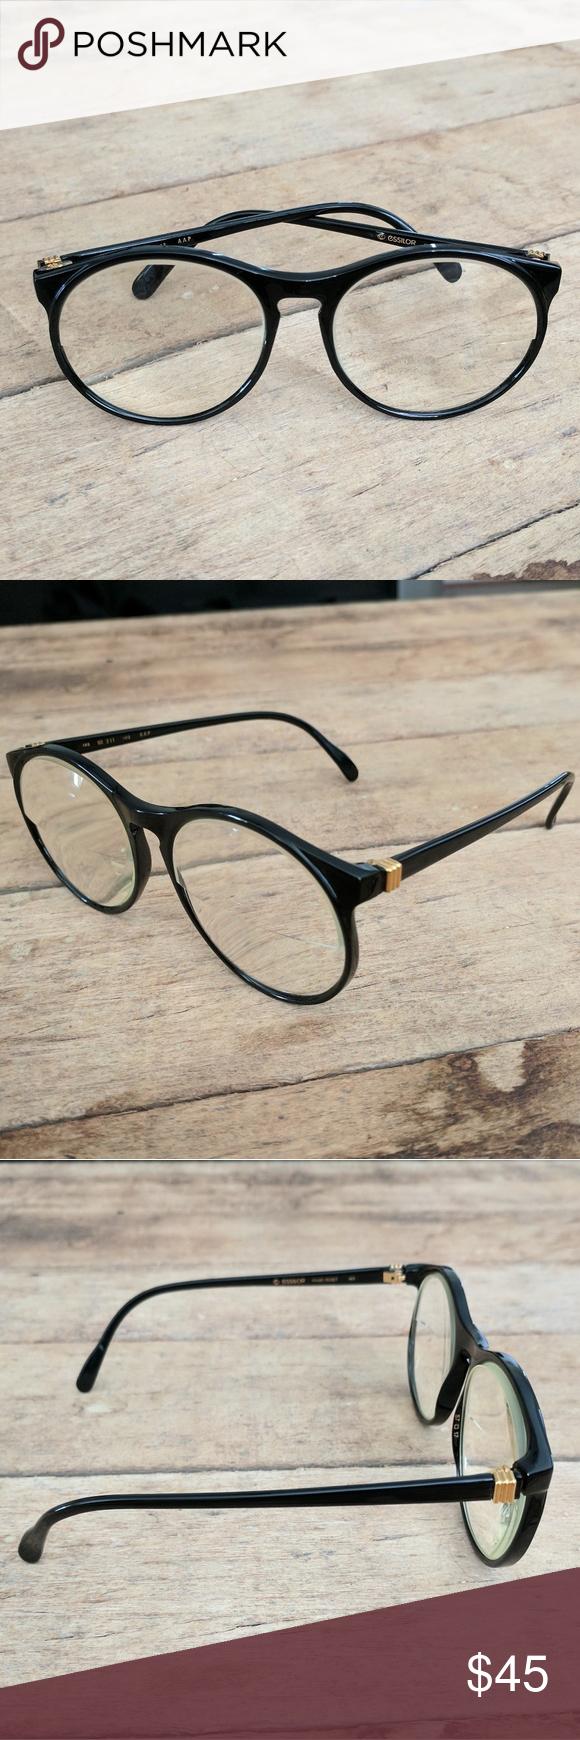 7a357358e4 Original vintage preppy librarian glasses